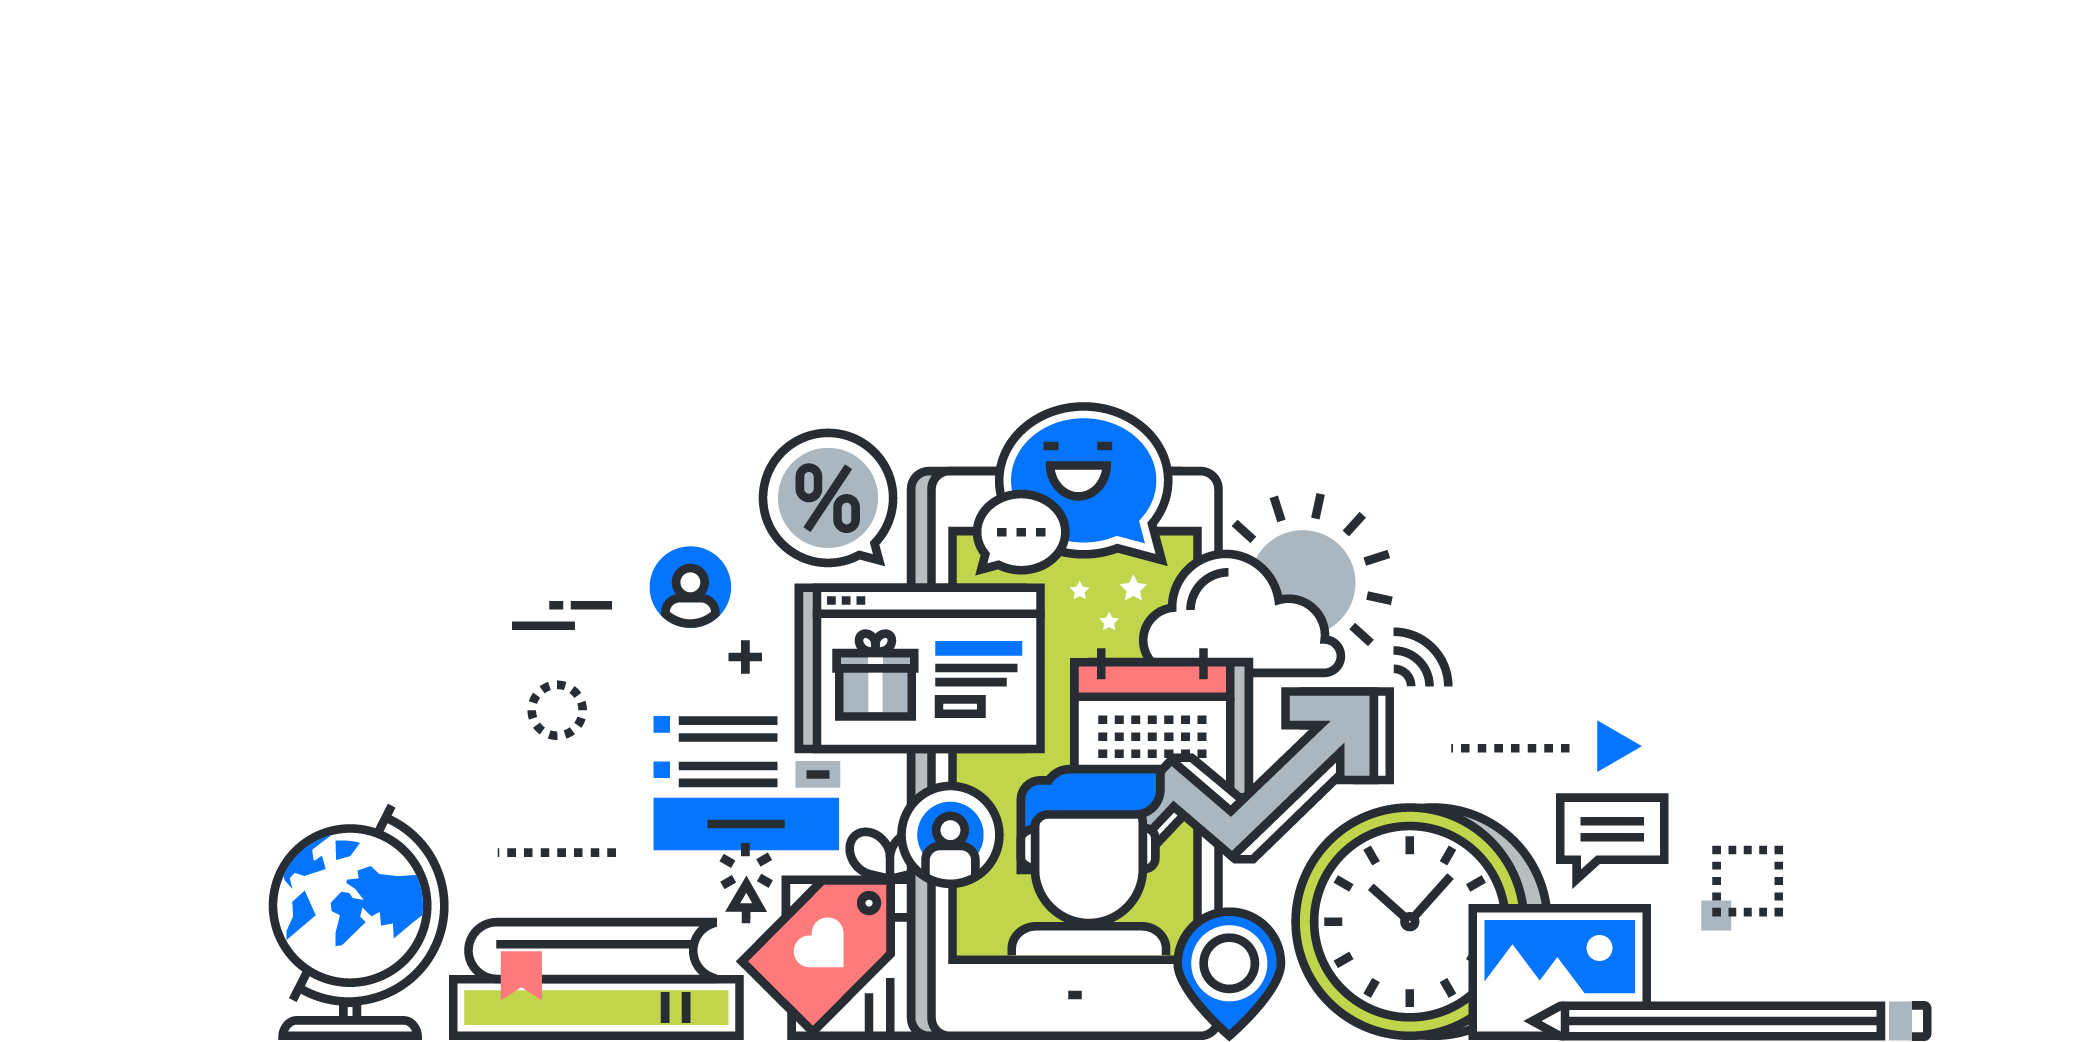 AMA16 mobile tech - Social media marketing services